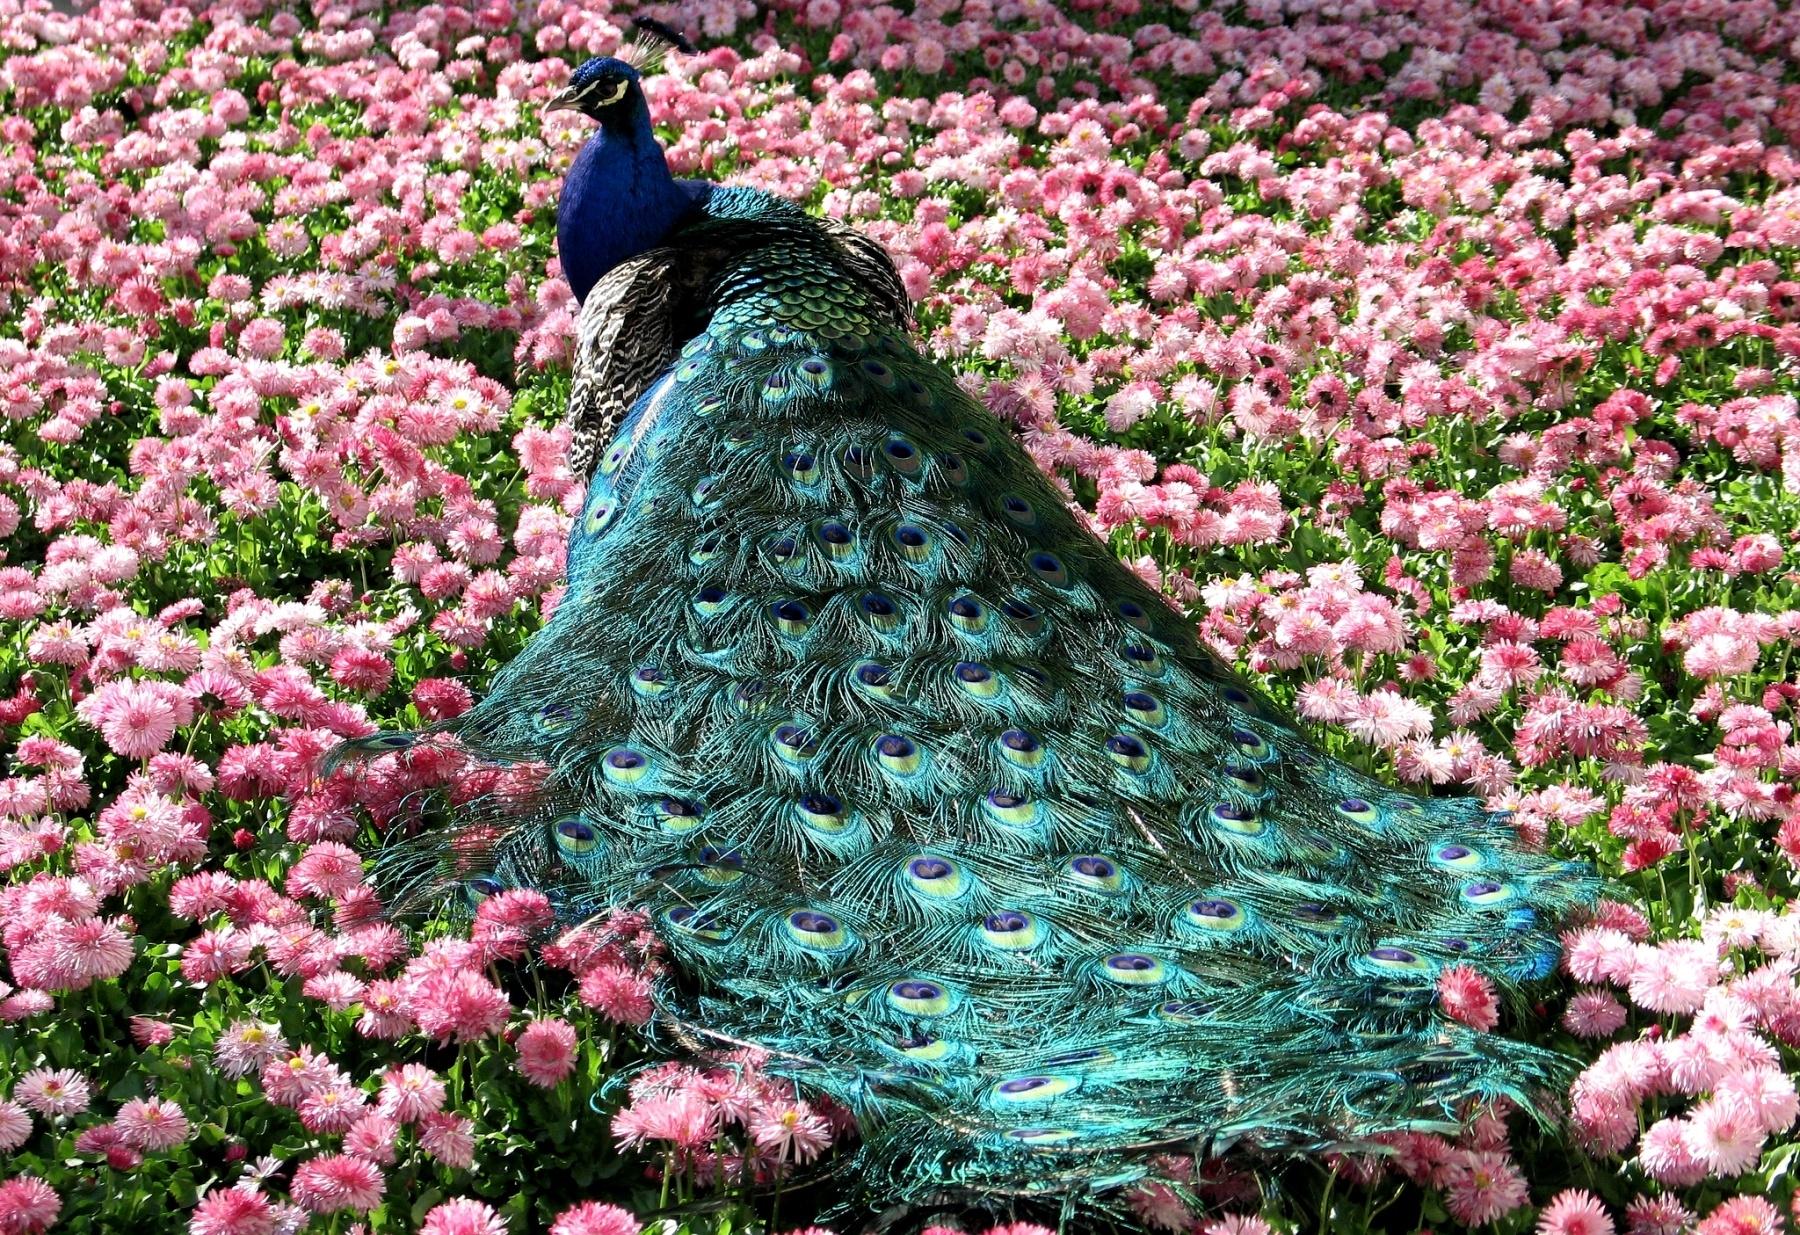 Wallpaper Peacock Tail Beautiful Grass Flowers 1800x1235